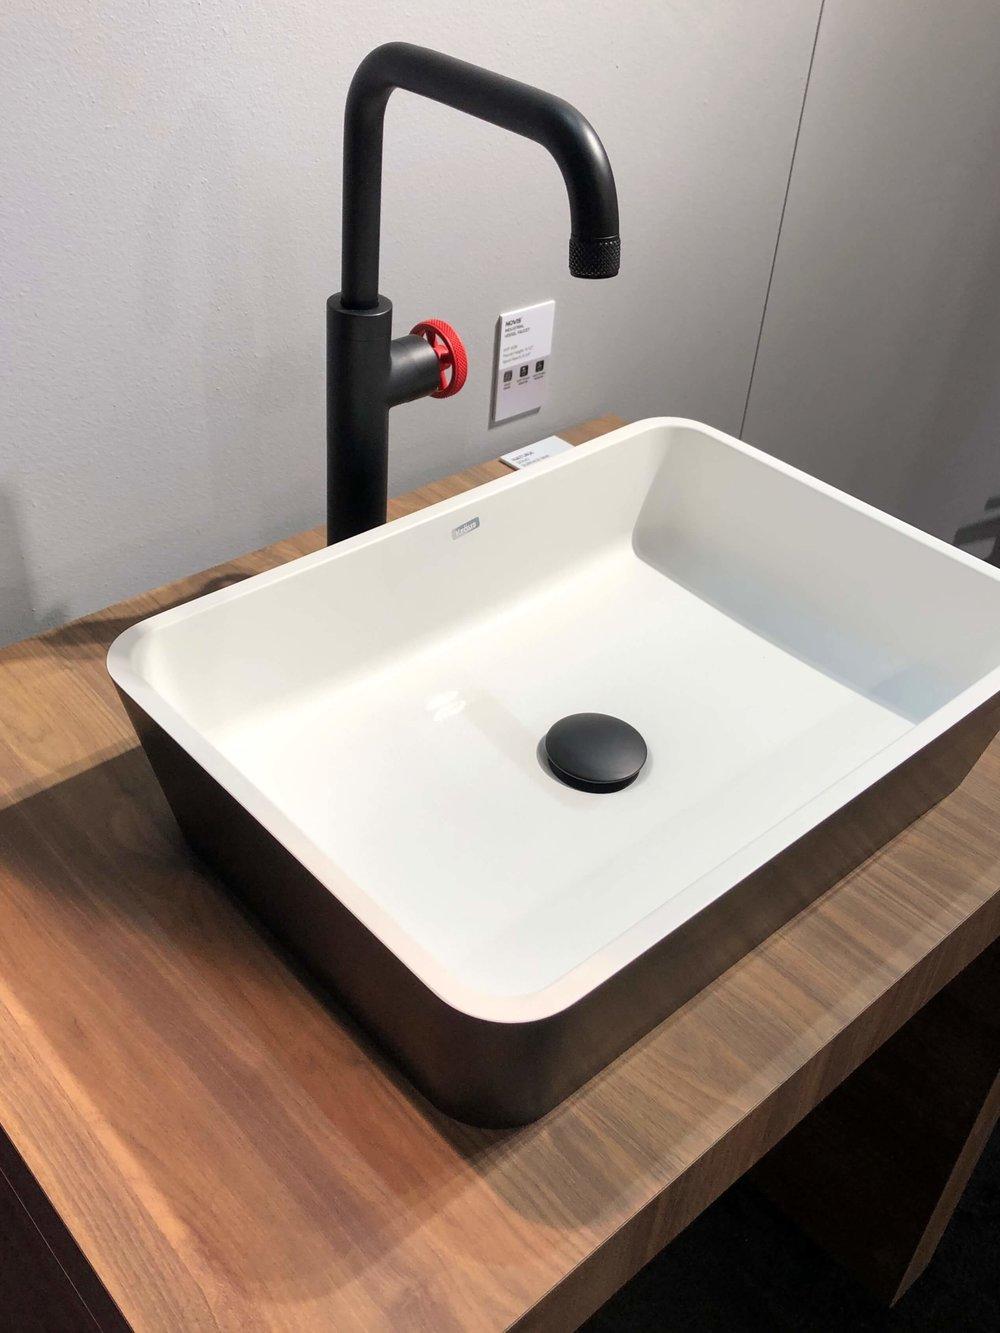 11 Best Black Bathroom Faucets Fixtures For The Best Bath Ever Designed